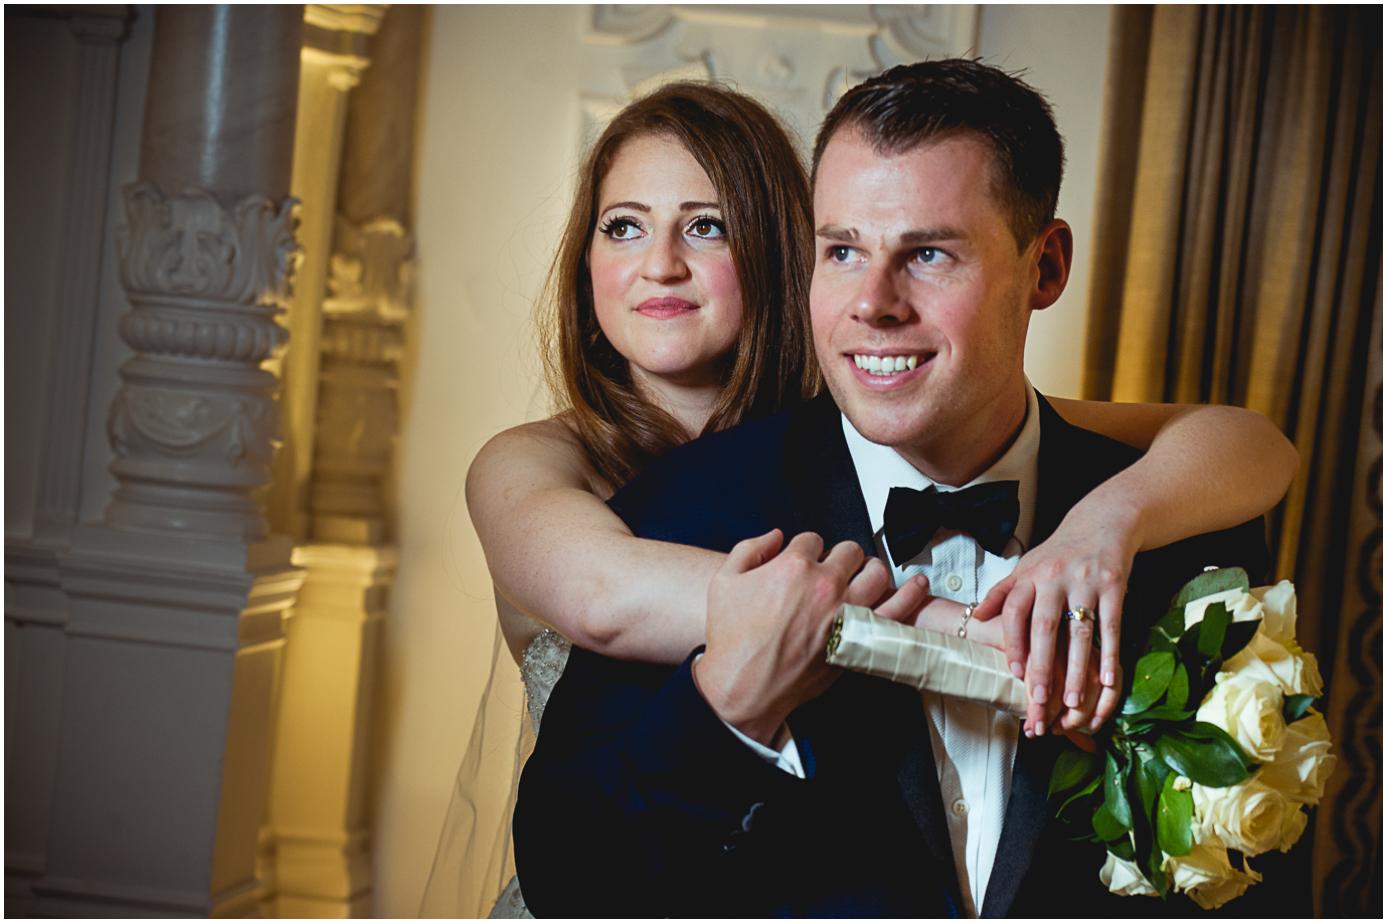 48 - Esmat and Angus - St. Ermin's Hotel London wedding photographer